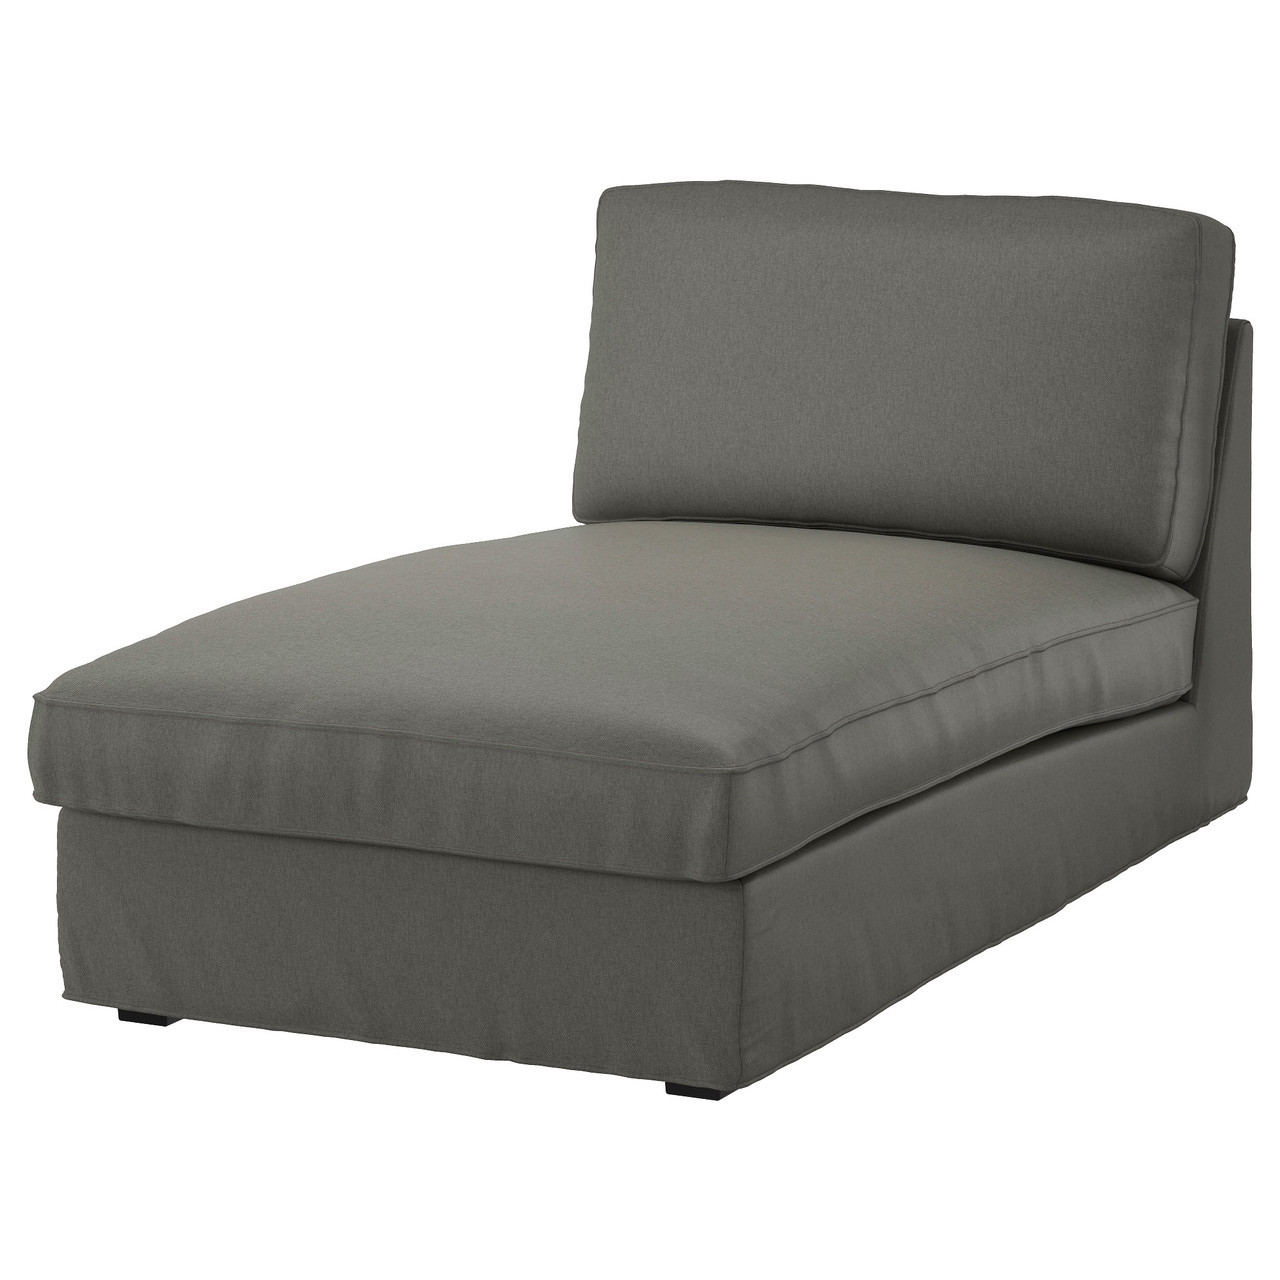 IKEA KIVIK Шезлонг, Борред побег  (291.839.85)